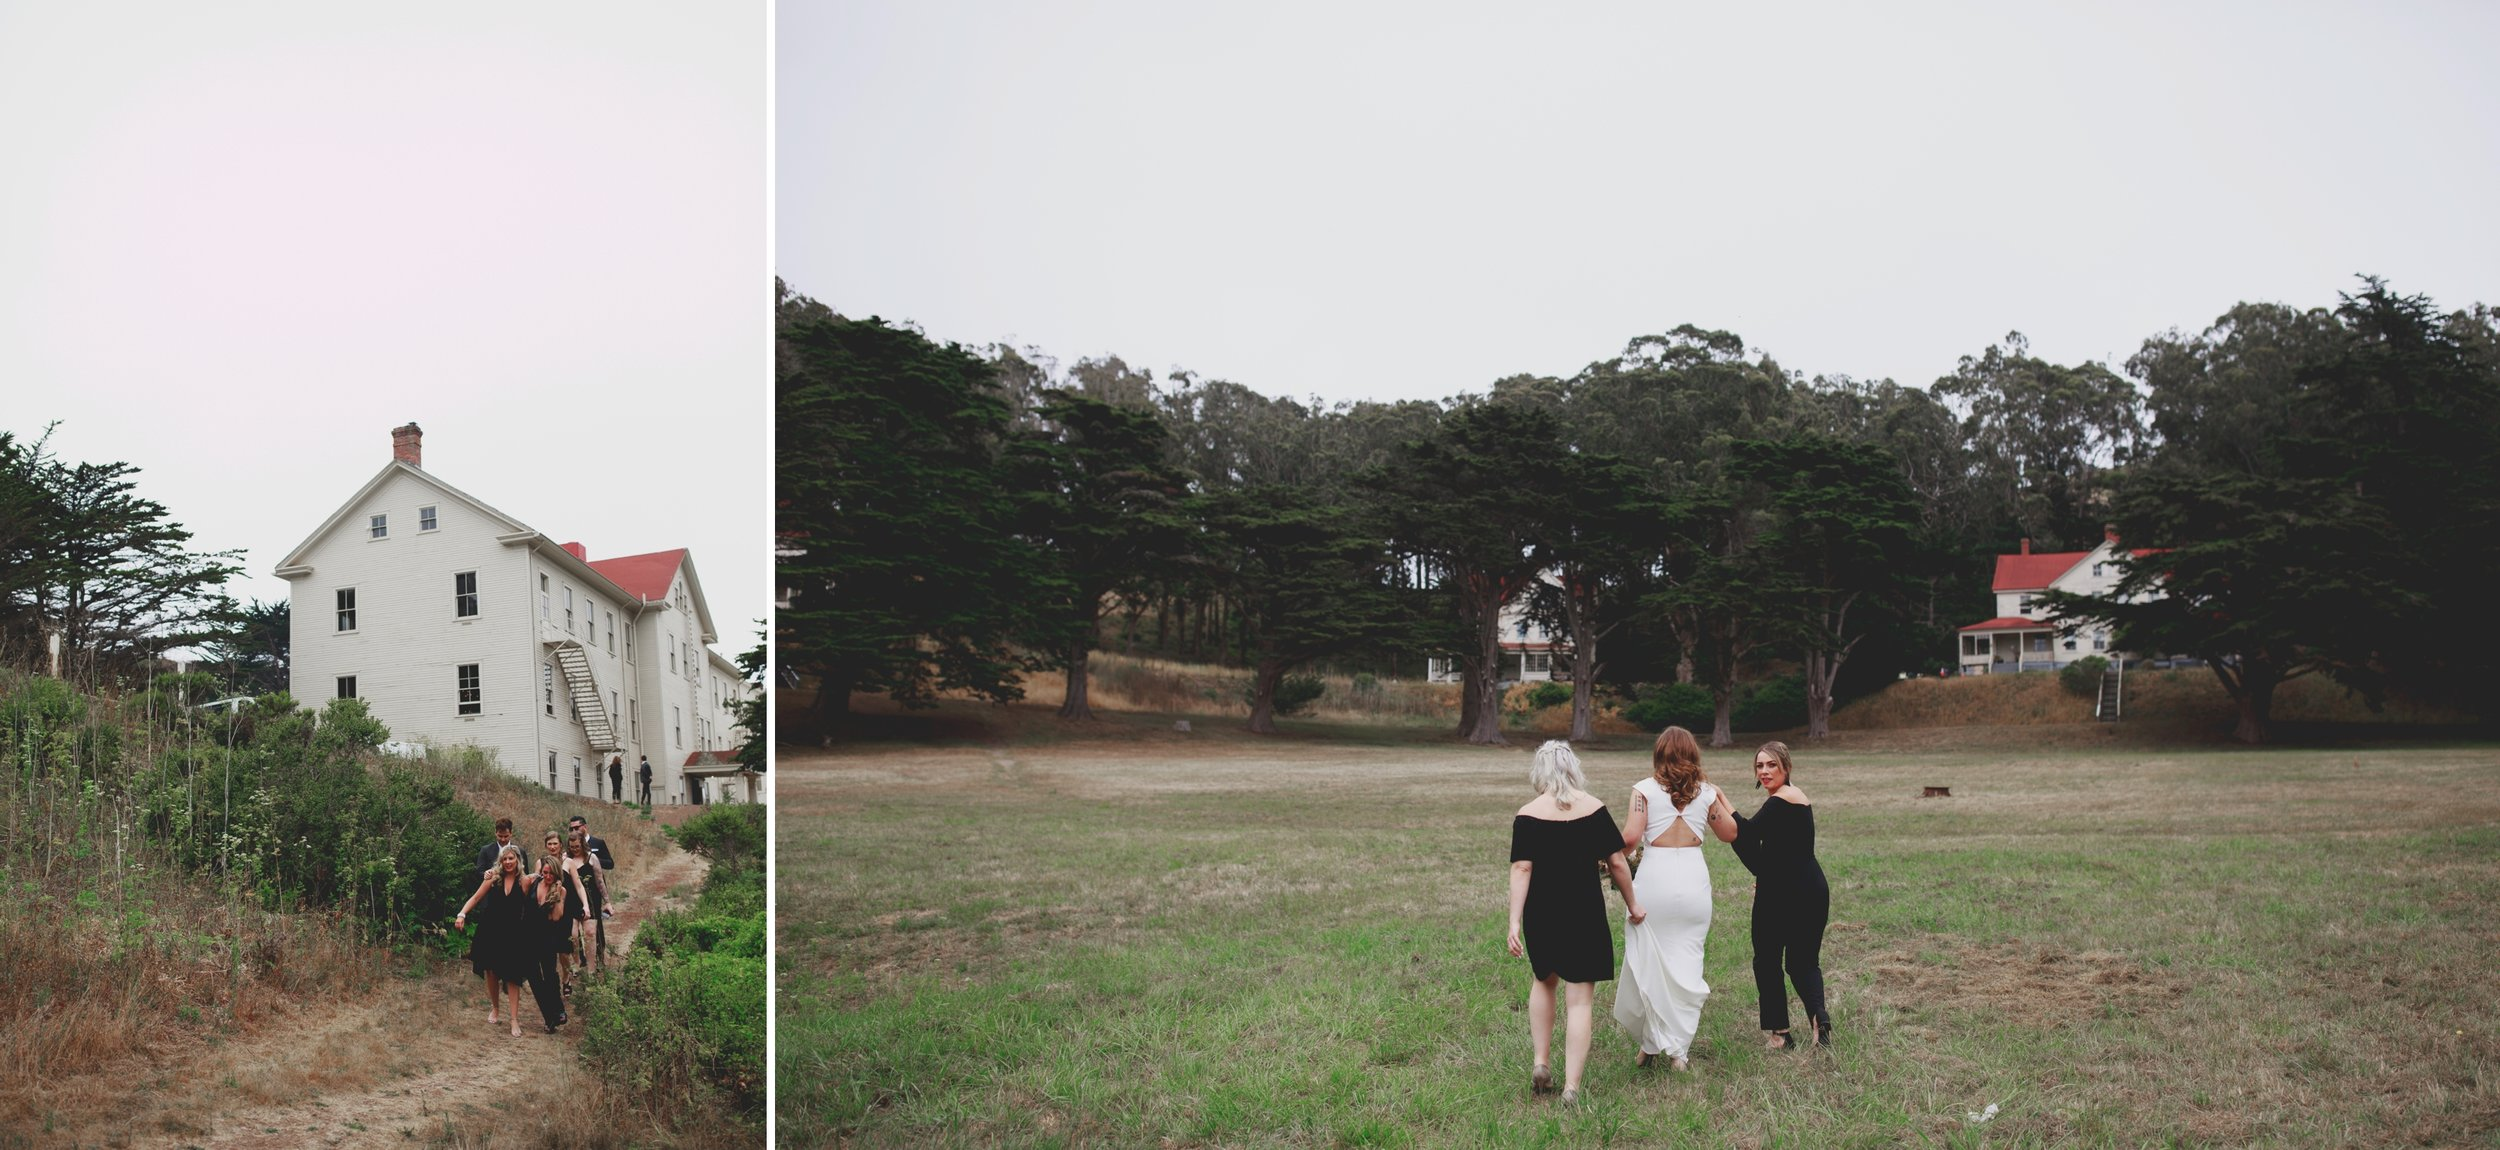 amandavanvels_headlands_center_wedding_san_francisco_045.jpg